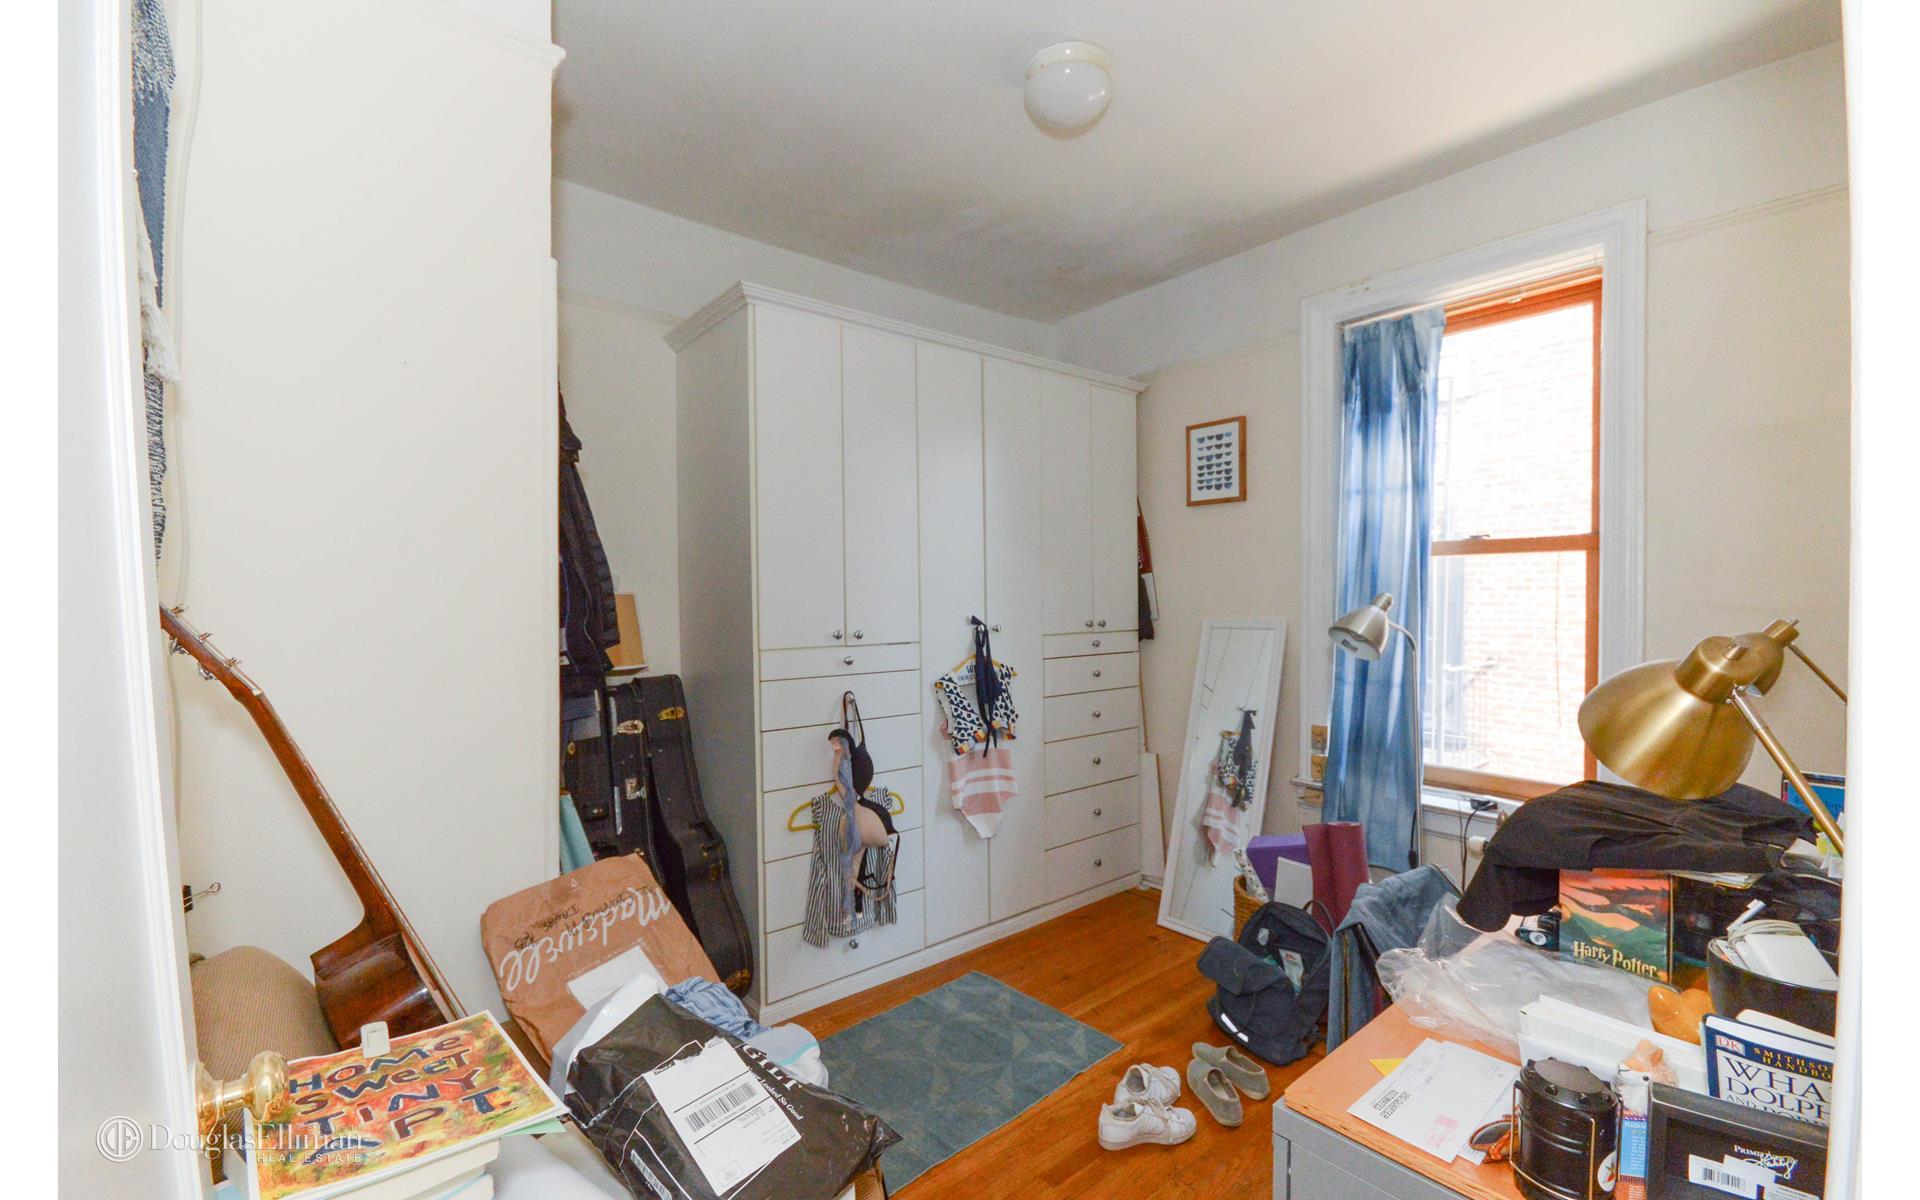 82 garfield pl brooklyn ny 11215 apartable for 10 grand army plaza 2nd floor brooklyn ny 11238